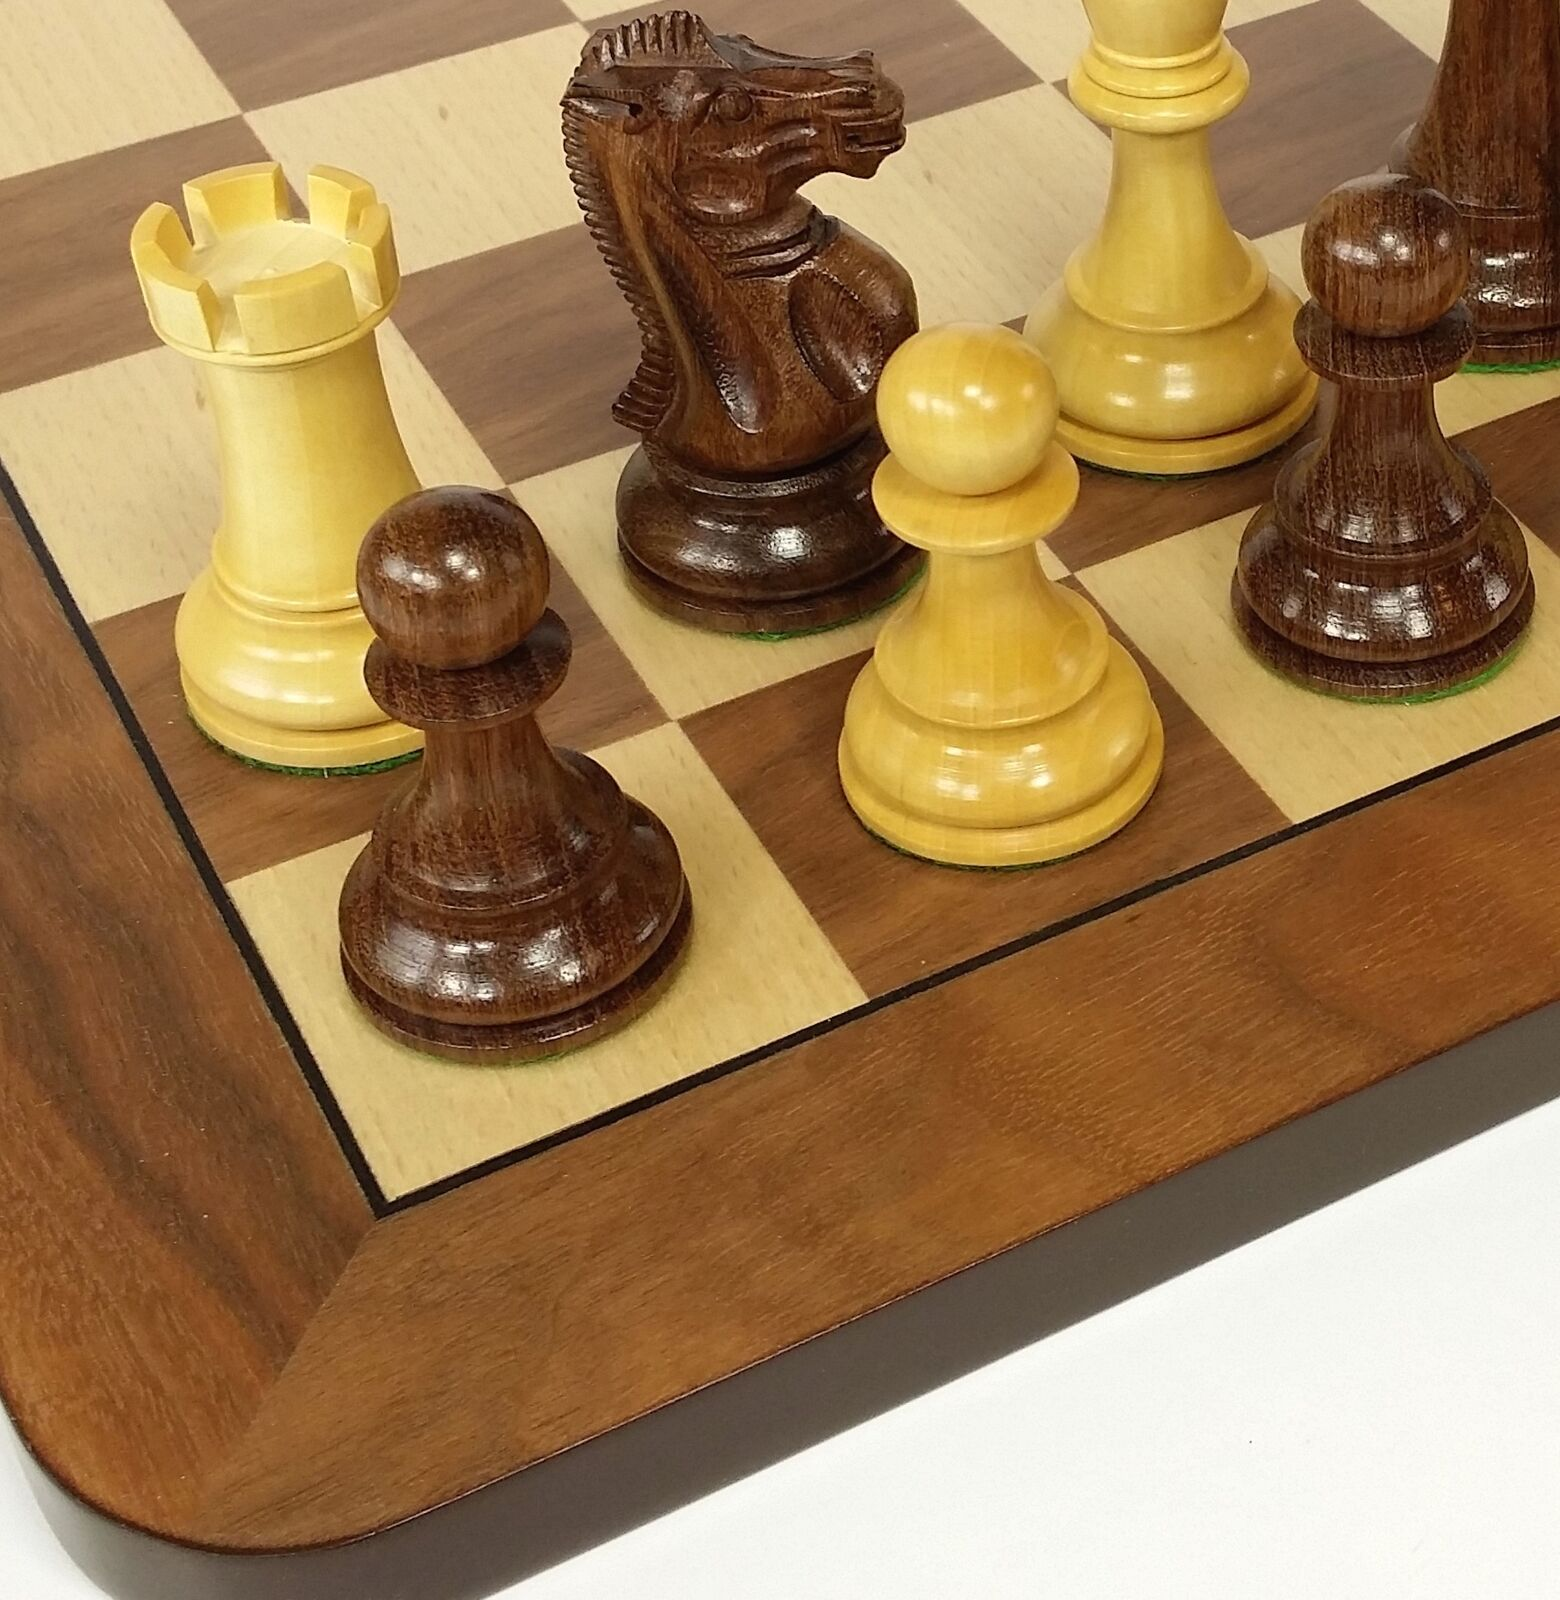 Sheesham 4 5 8  KIng Anderssen Staunton Wood Chess Set Large 19  Walnut Board